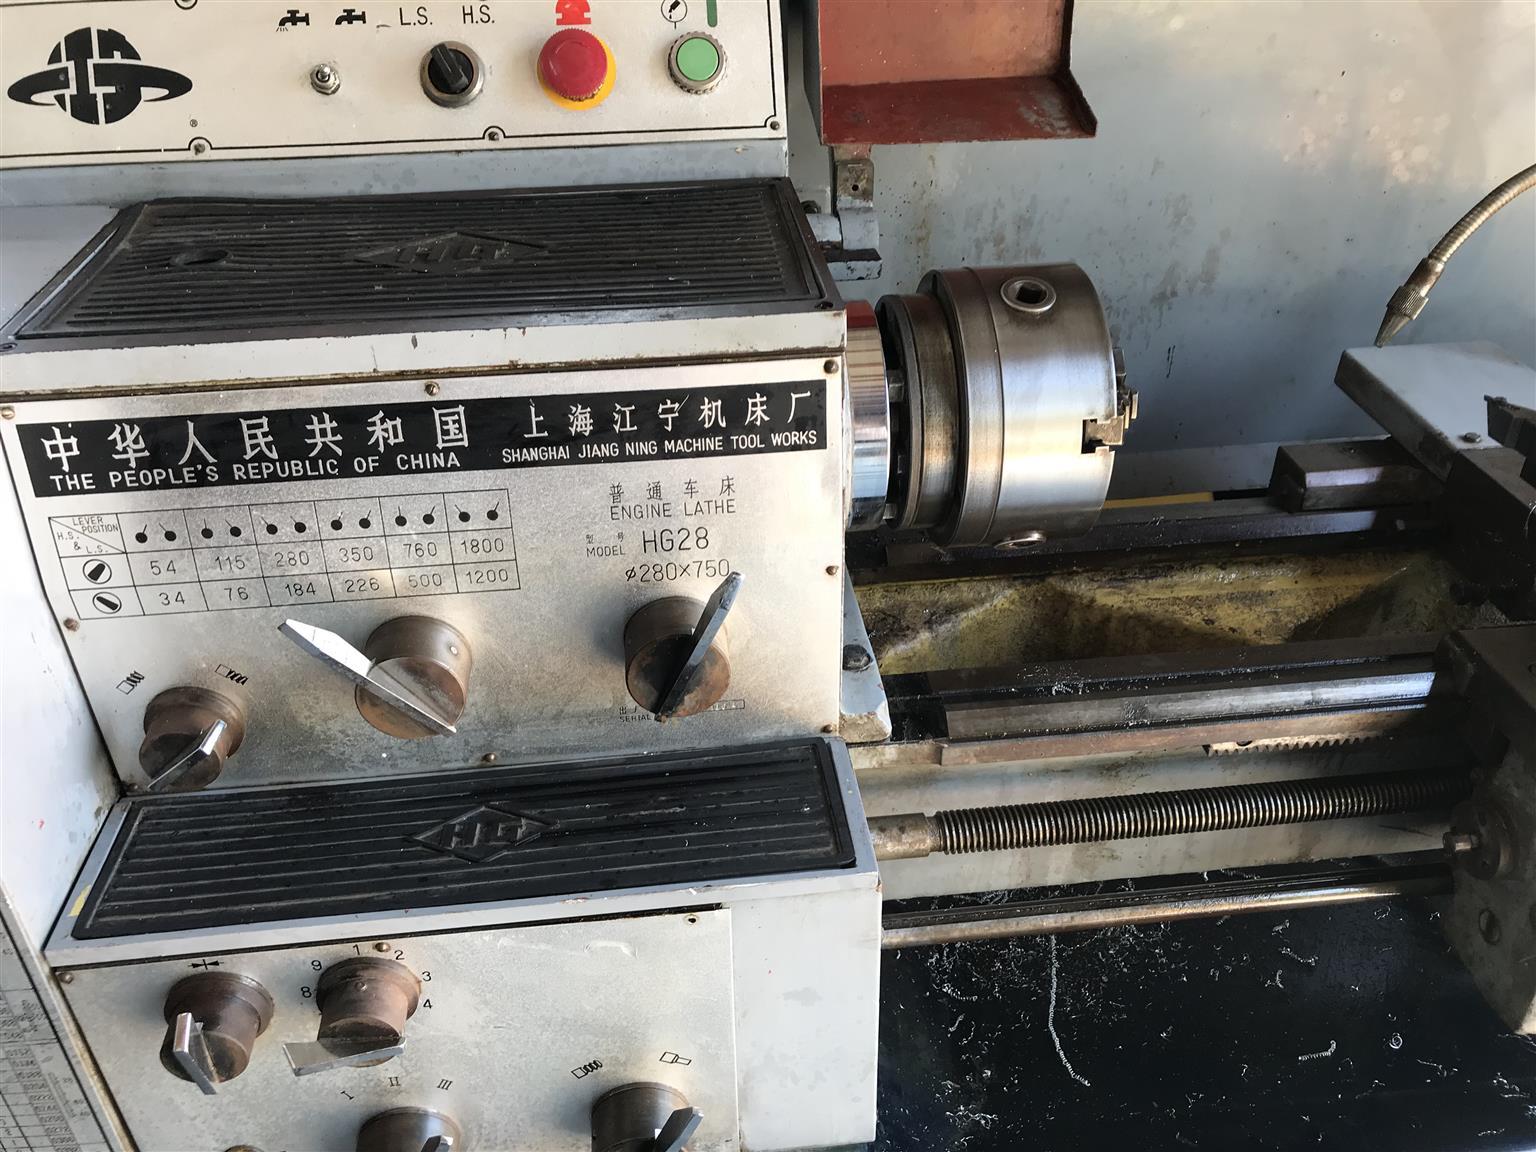 Workshop Machines for sale